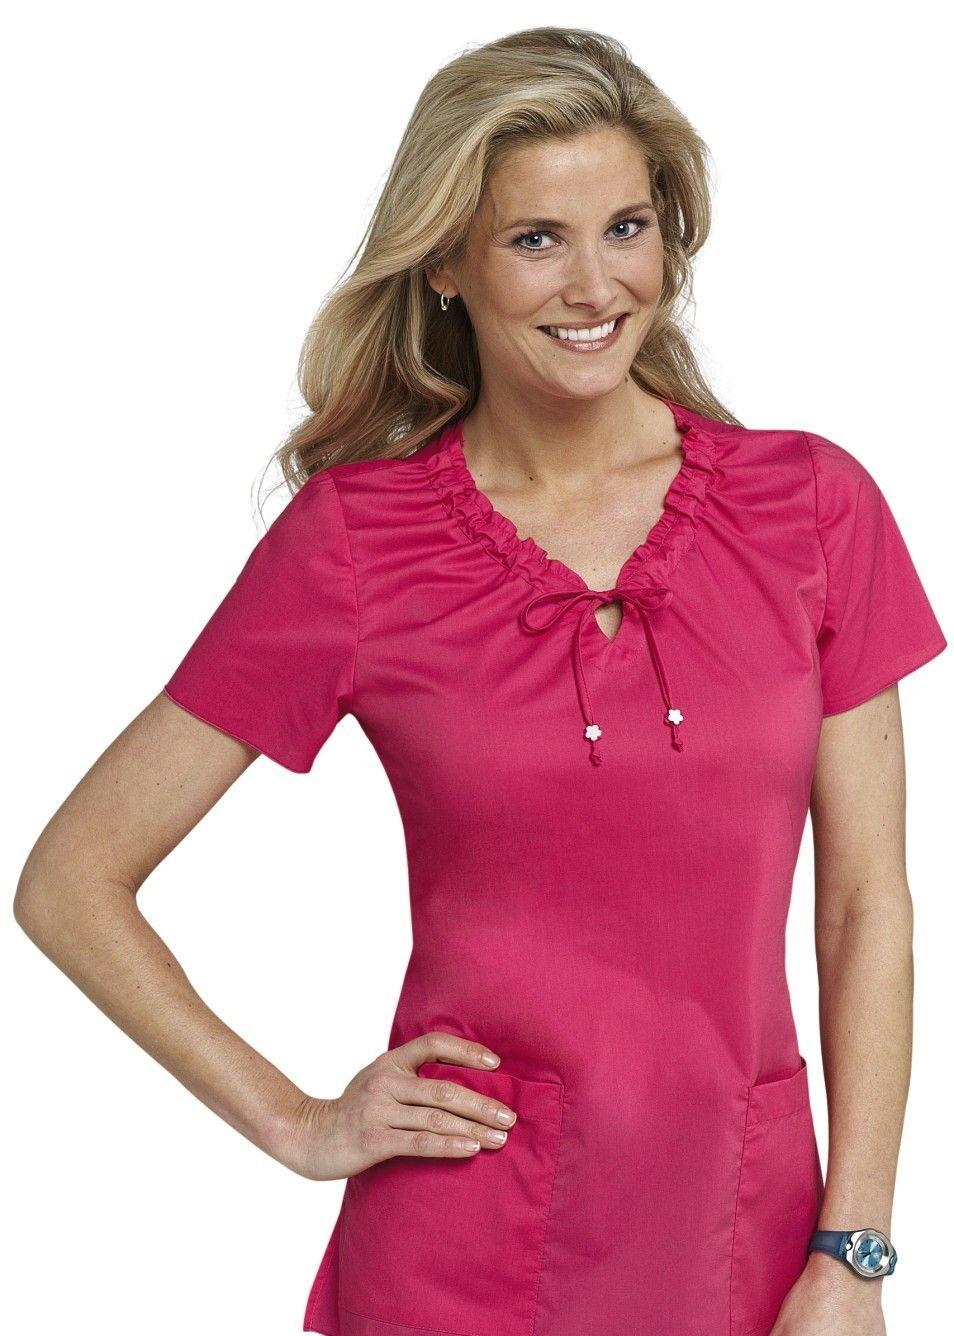 New color for summer Flamingo! Koi Betsey v-neck scrub top ...